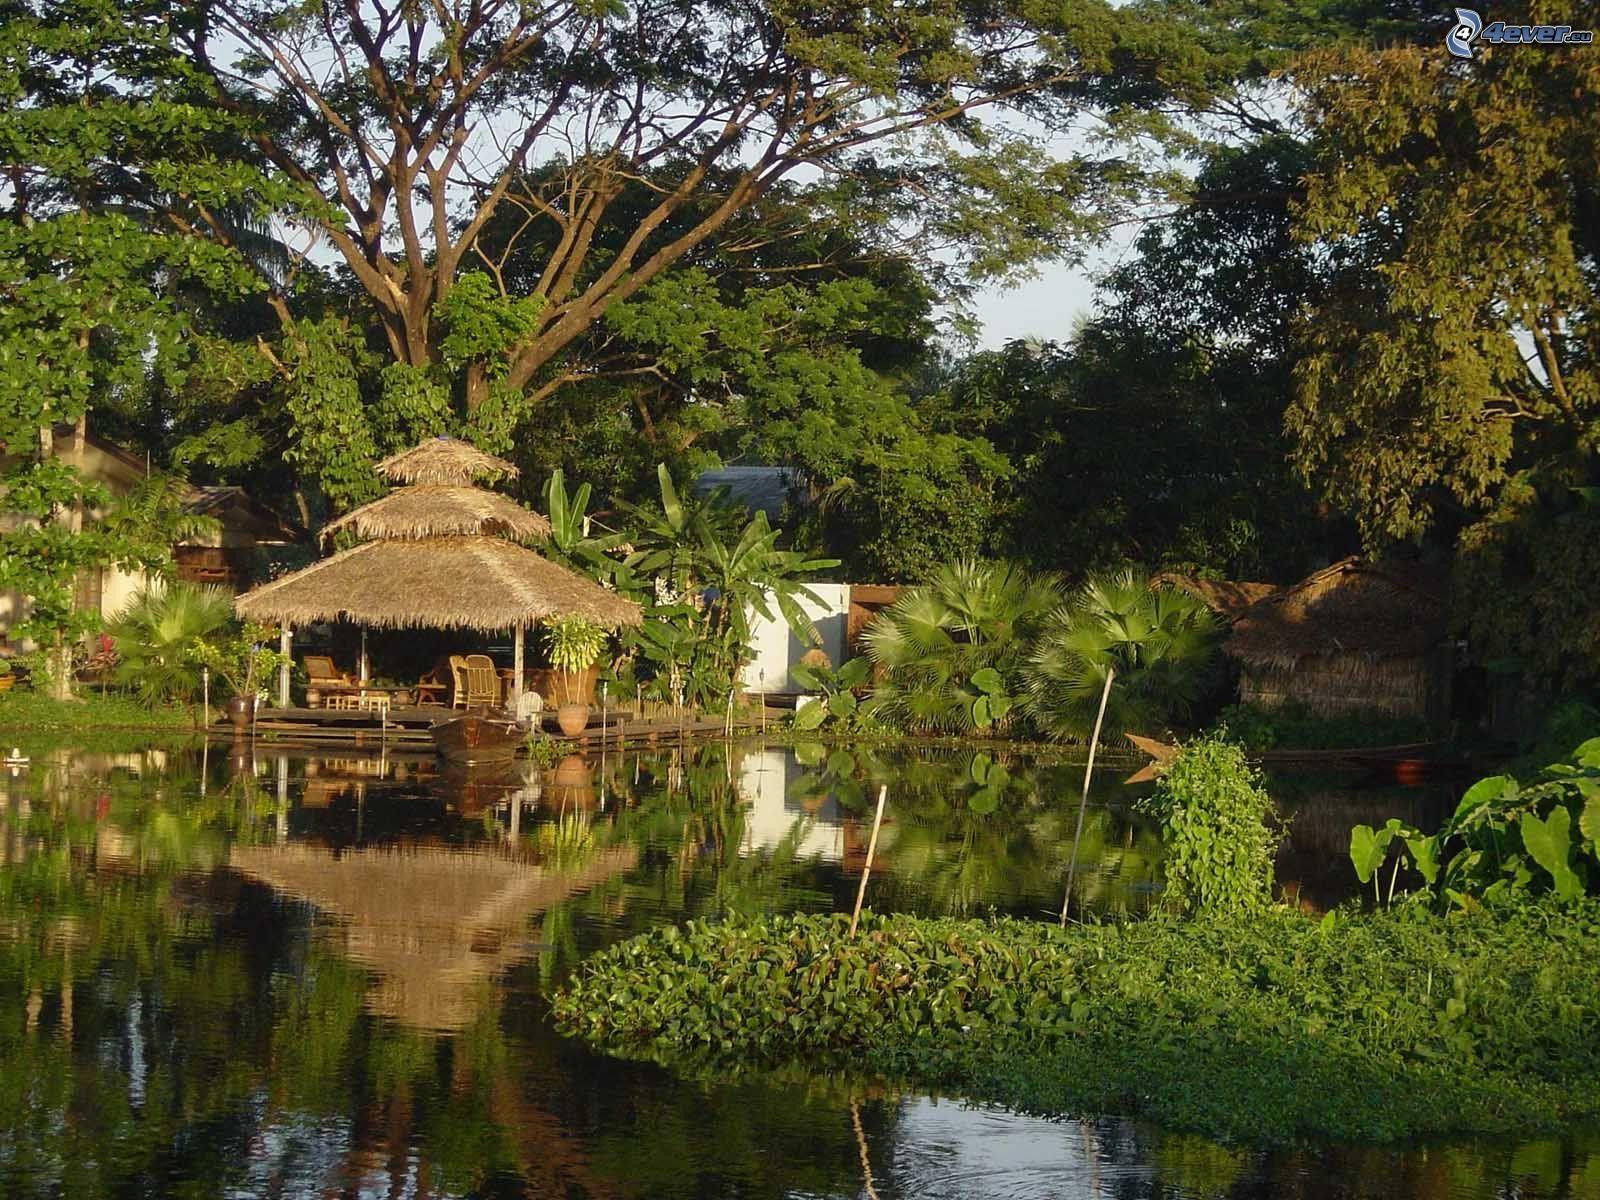 House on water for Casa de jardin mobile home park